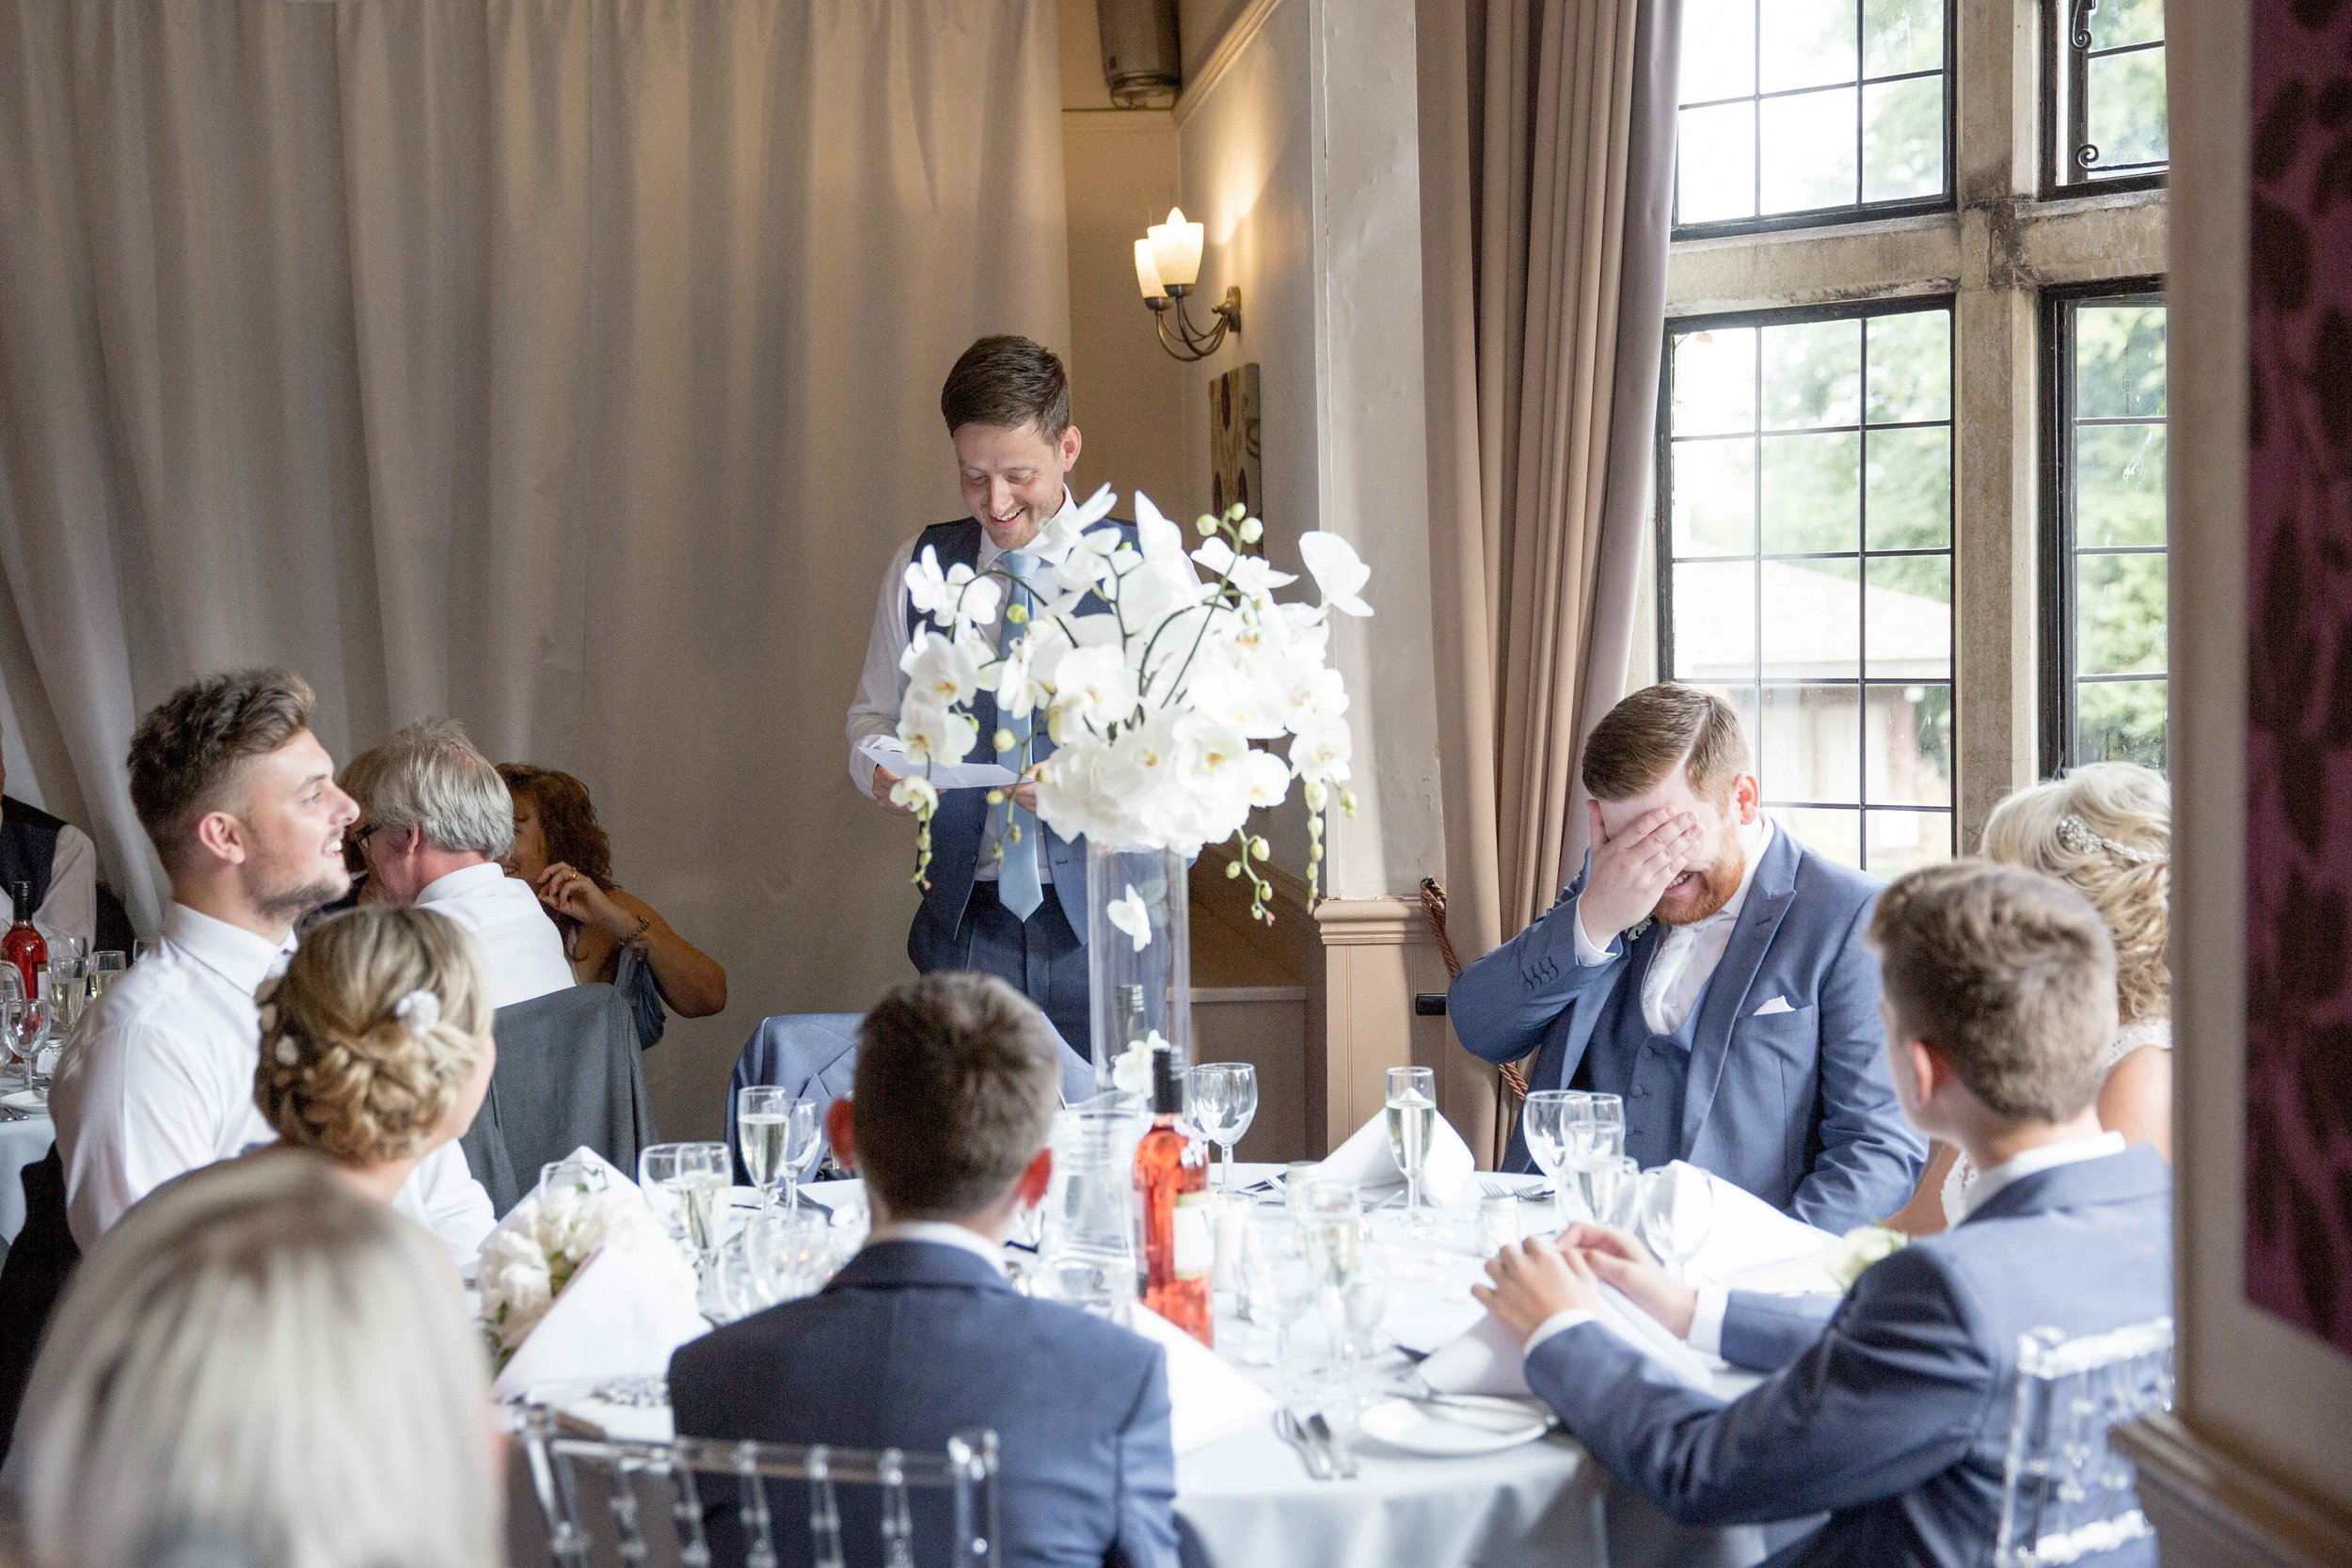 cotswold-wedding-photography-at-stonehouse-court-hotel-natalia-smith-photography-gloucestershire-wedding-photographer-85.jpg